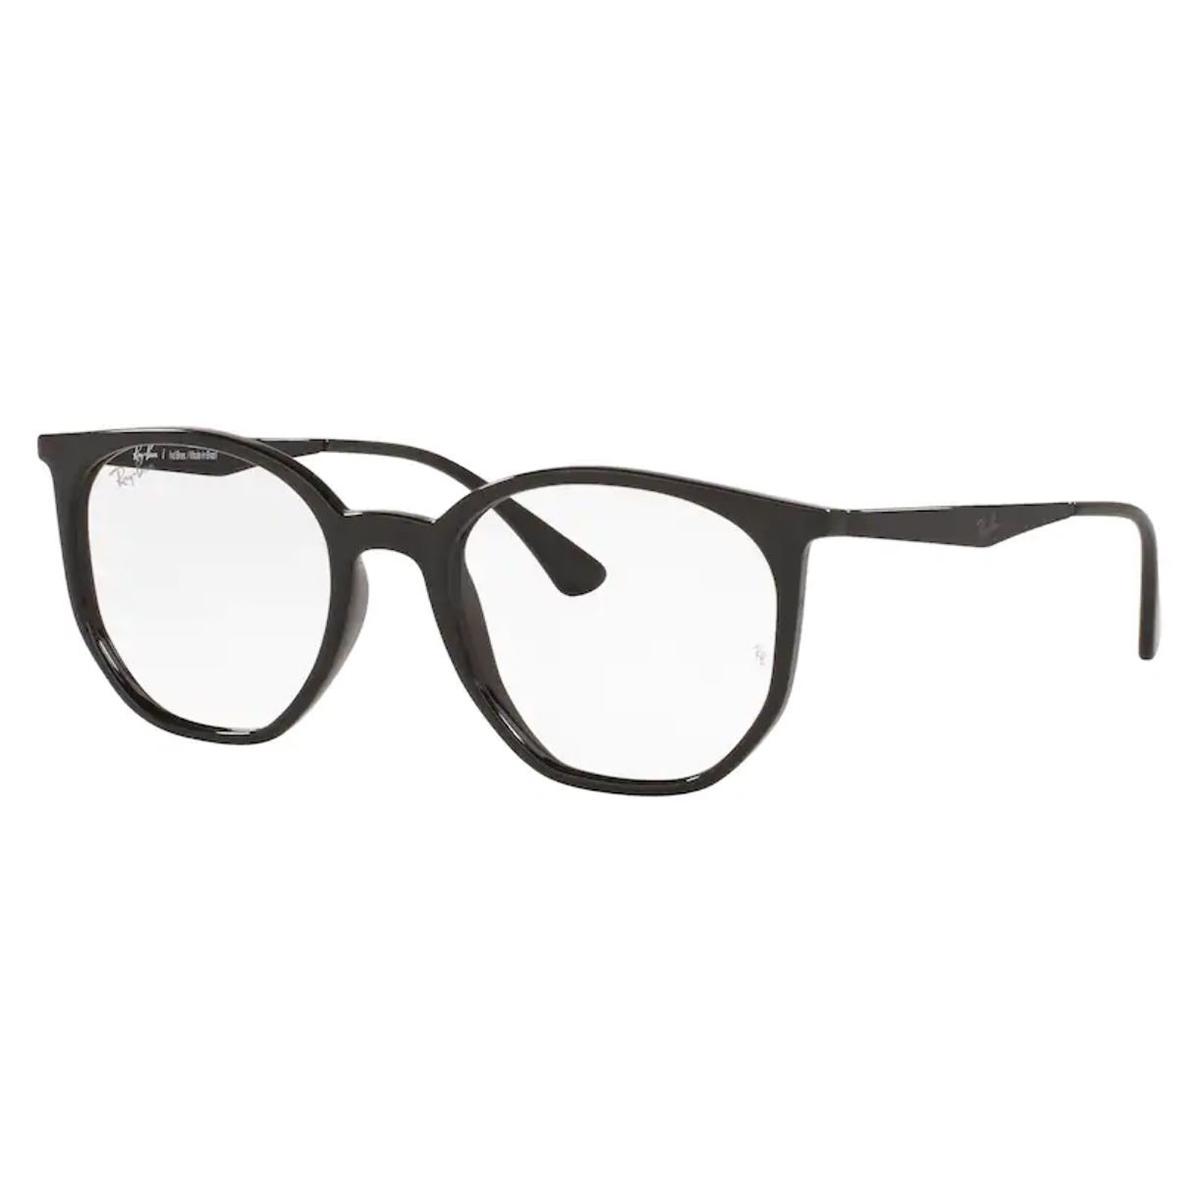 Óculos de Grau Ray Ban RX7174L Preto Brilho Tamanho 52